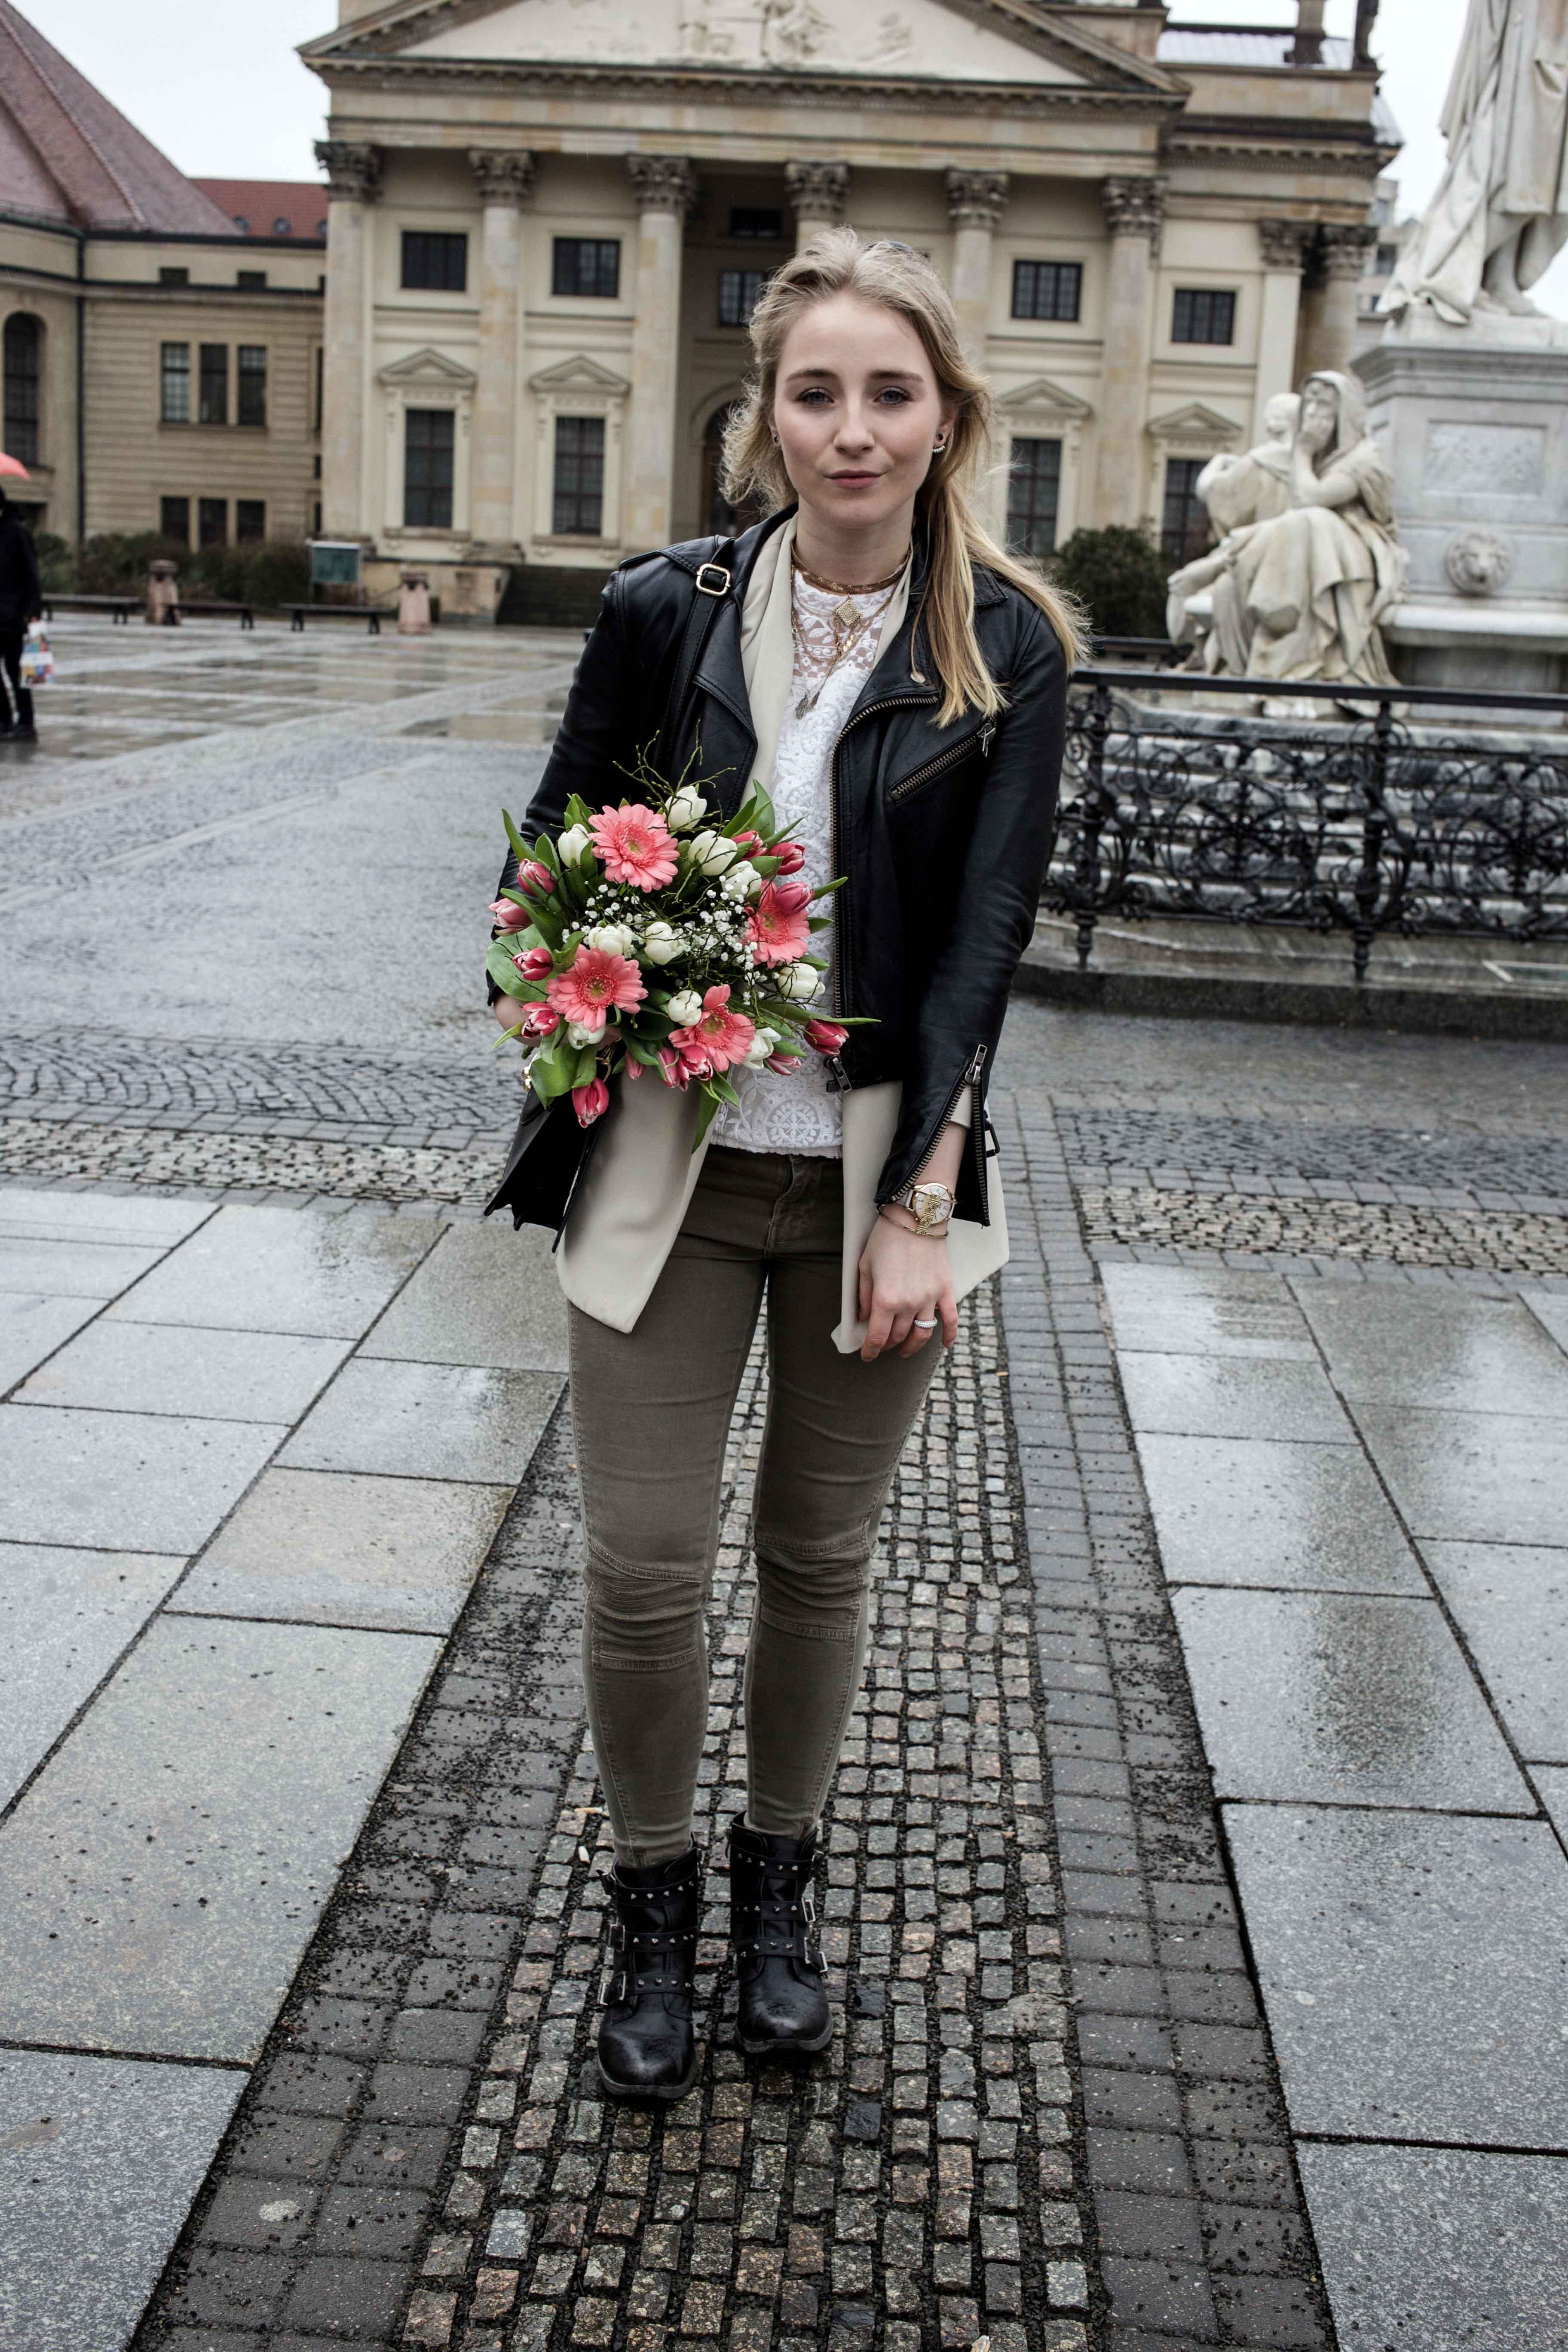 grüne-biker-jeans-geburtstags-outfit-lederjacke-berlin-gendarmenmarkt-modeblogger-fashionblog_0411